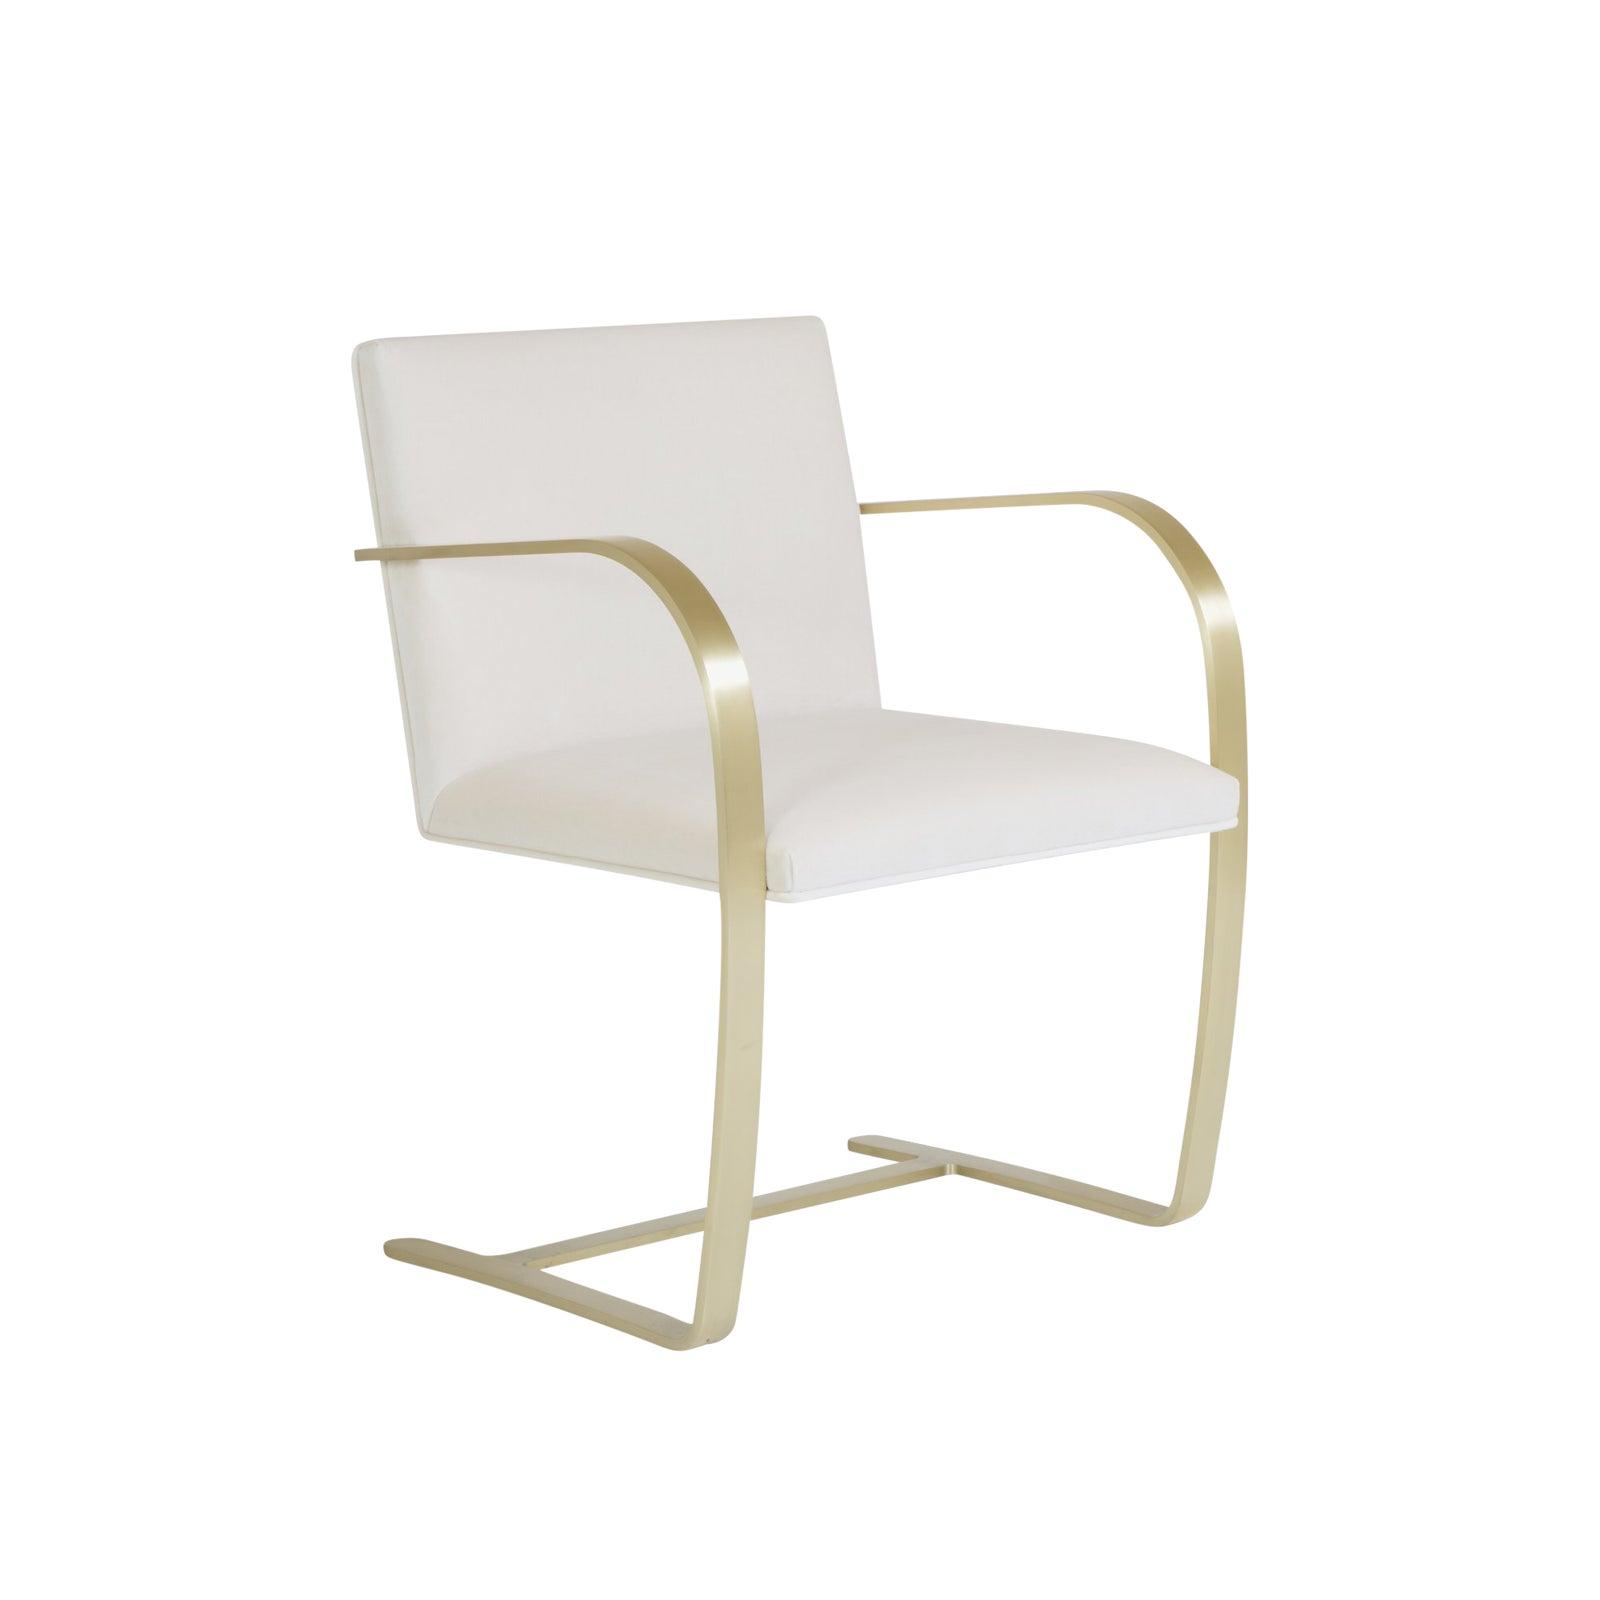 Brno Flat-Bar Chairs in Crème Velvet, Brushed Brass  Chairish